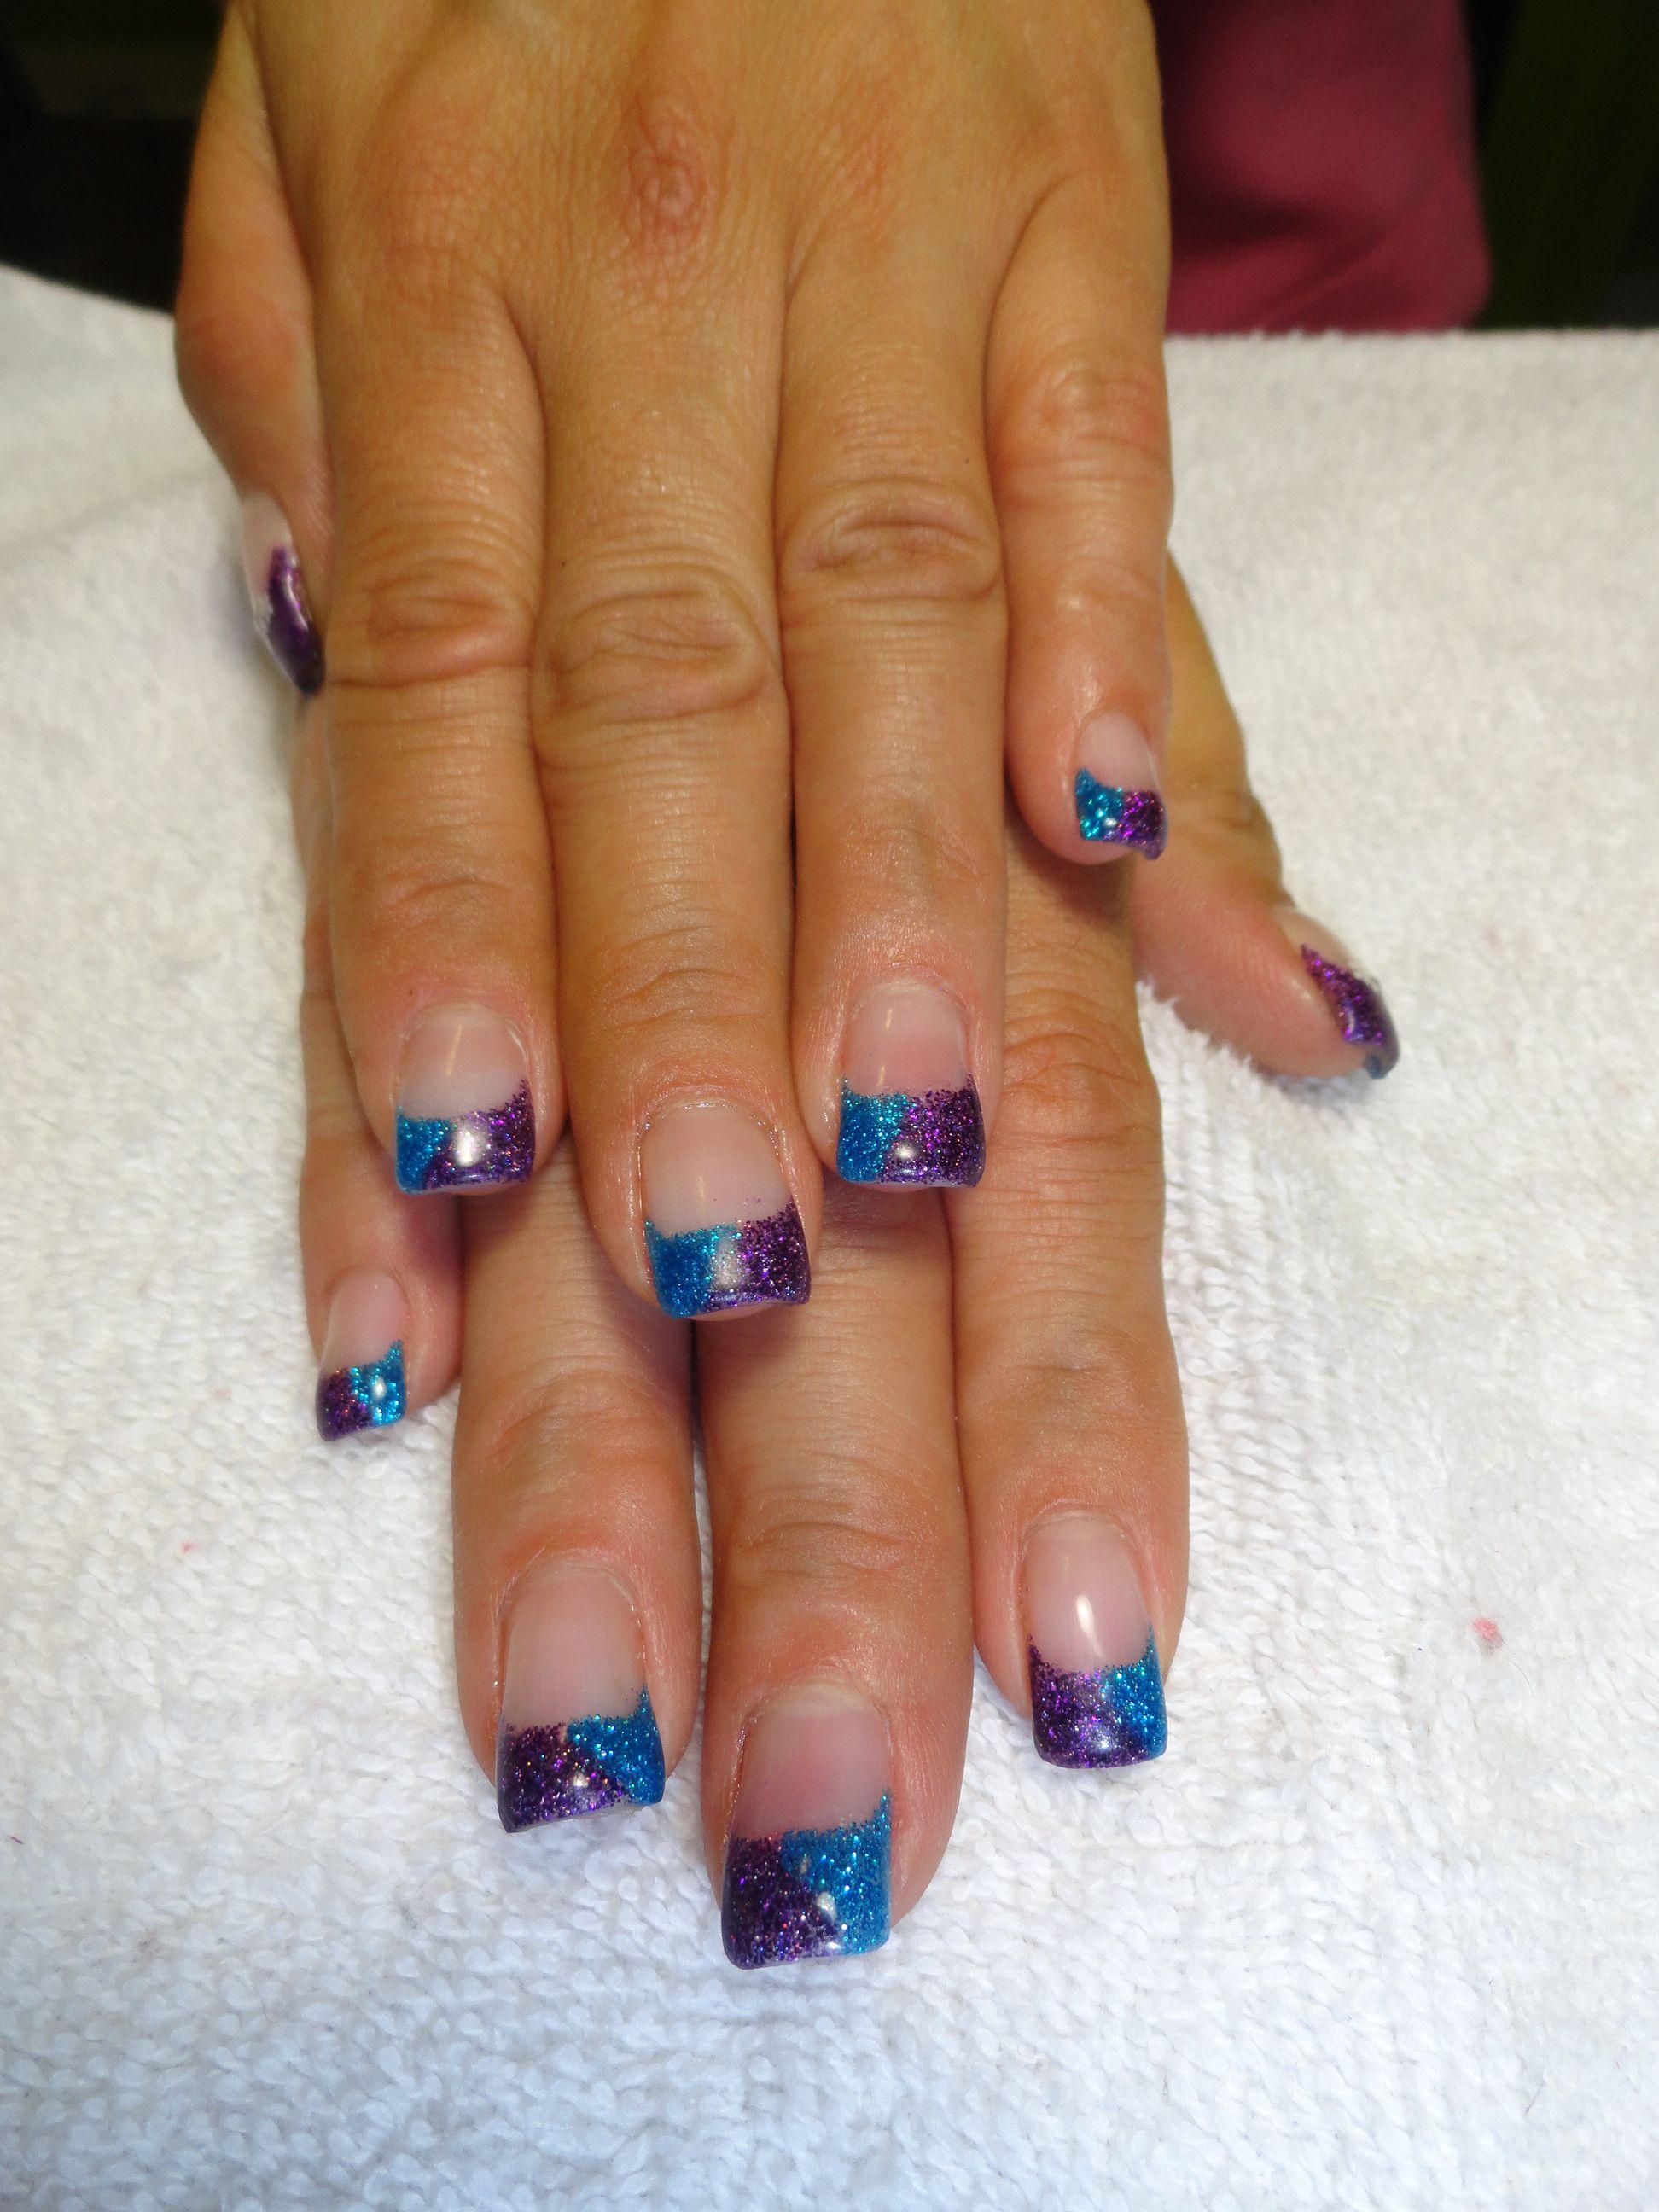 Blue Purple Glitter Gel Nail Tips I Love These Two Colors Together Glitter Gel Nails Gel Nail Tips Glitter Gel